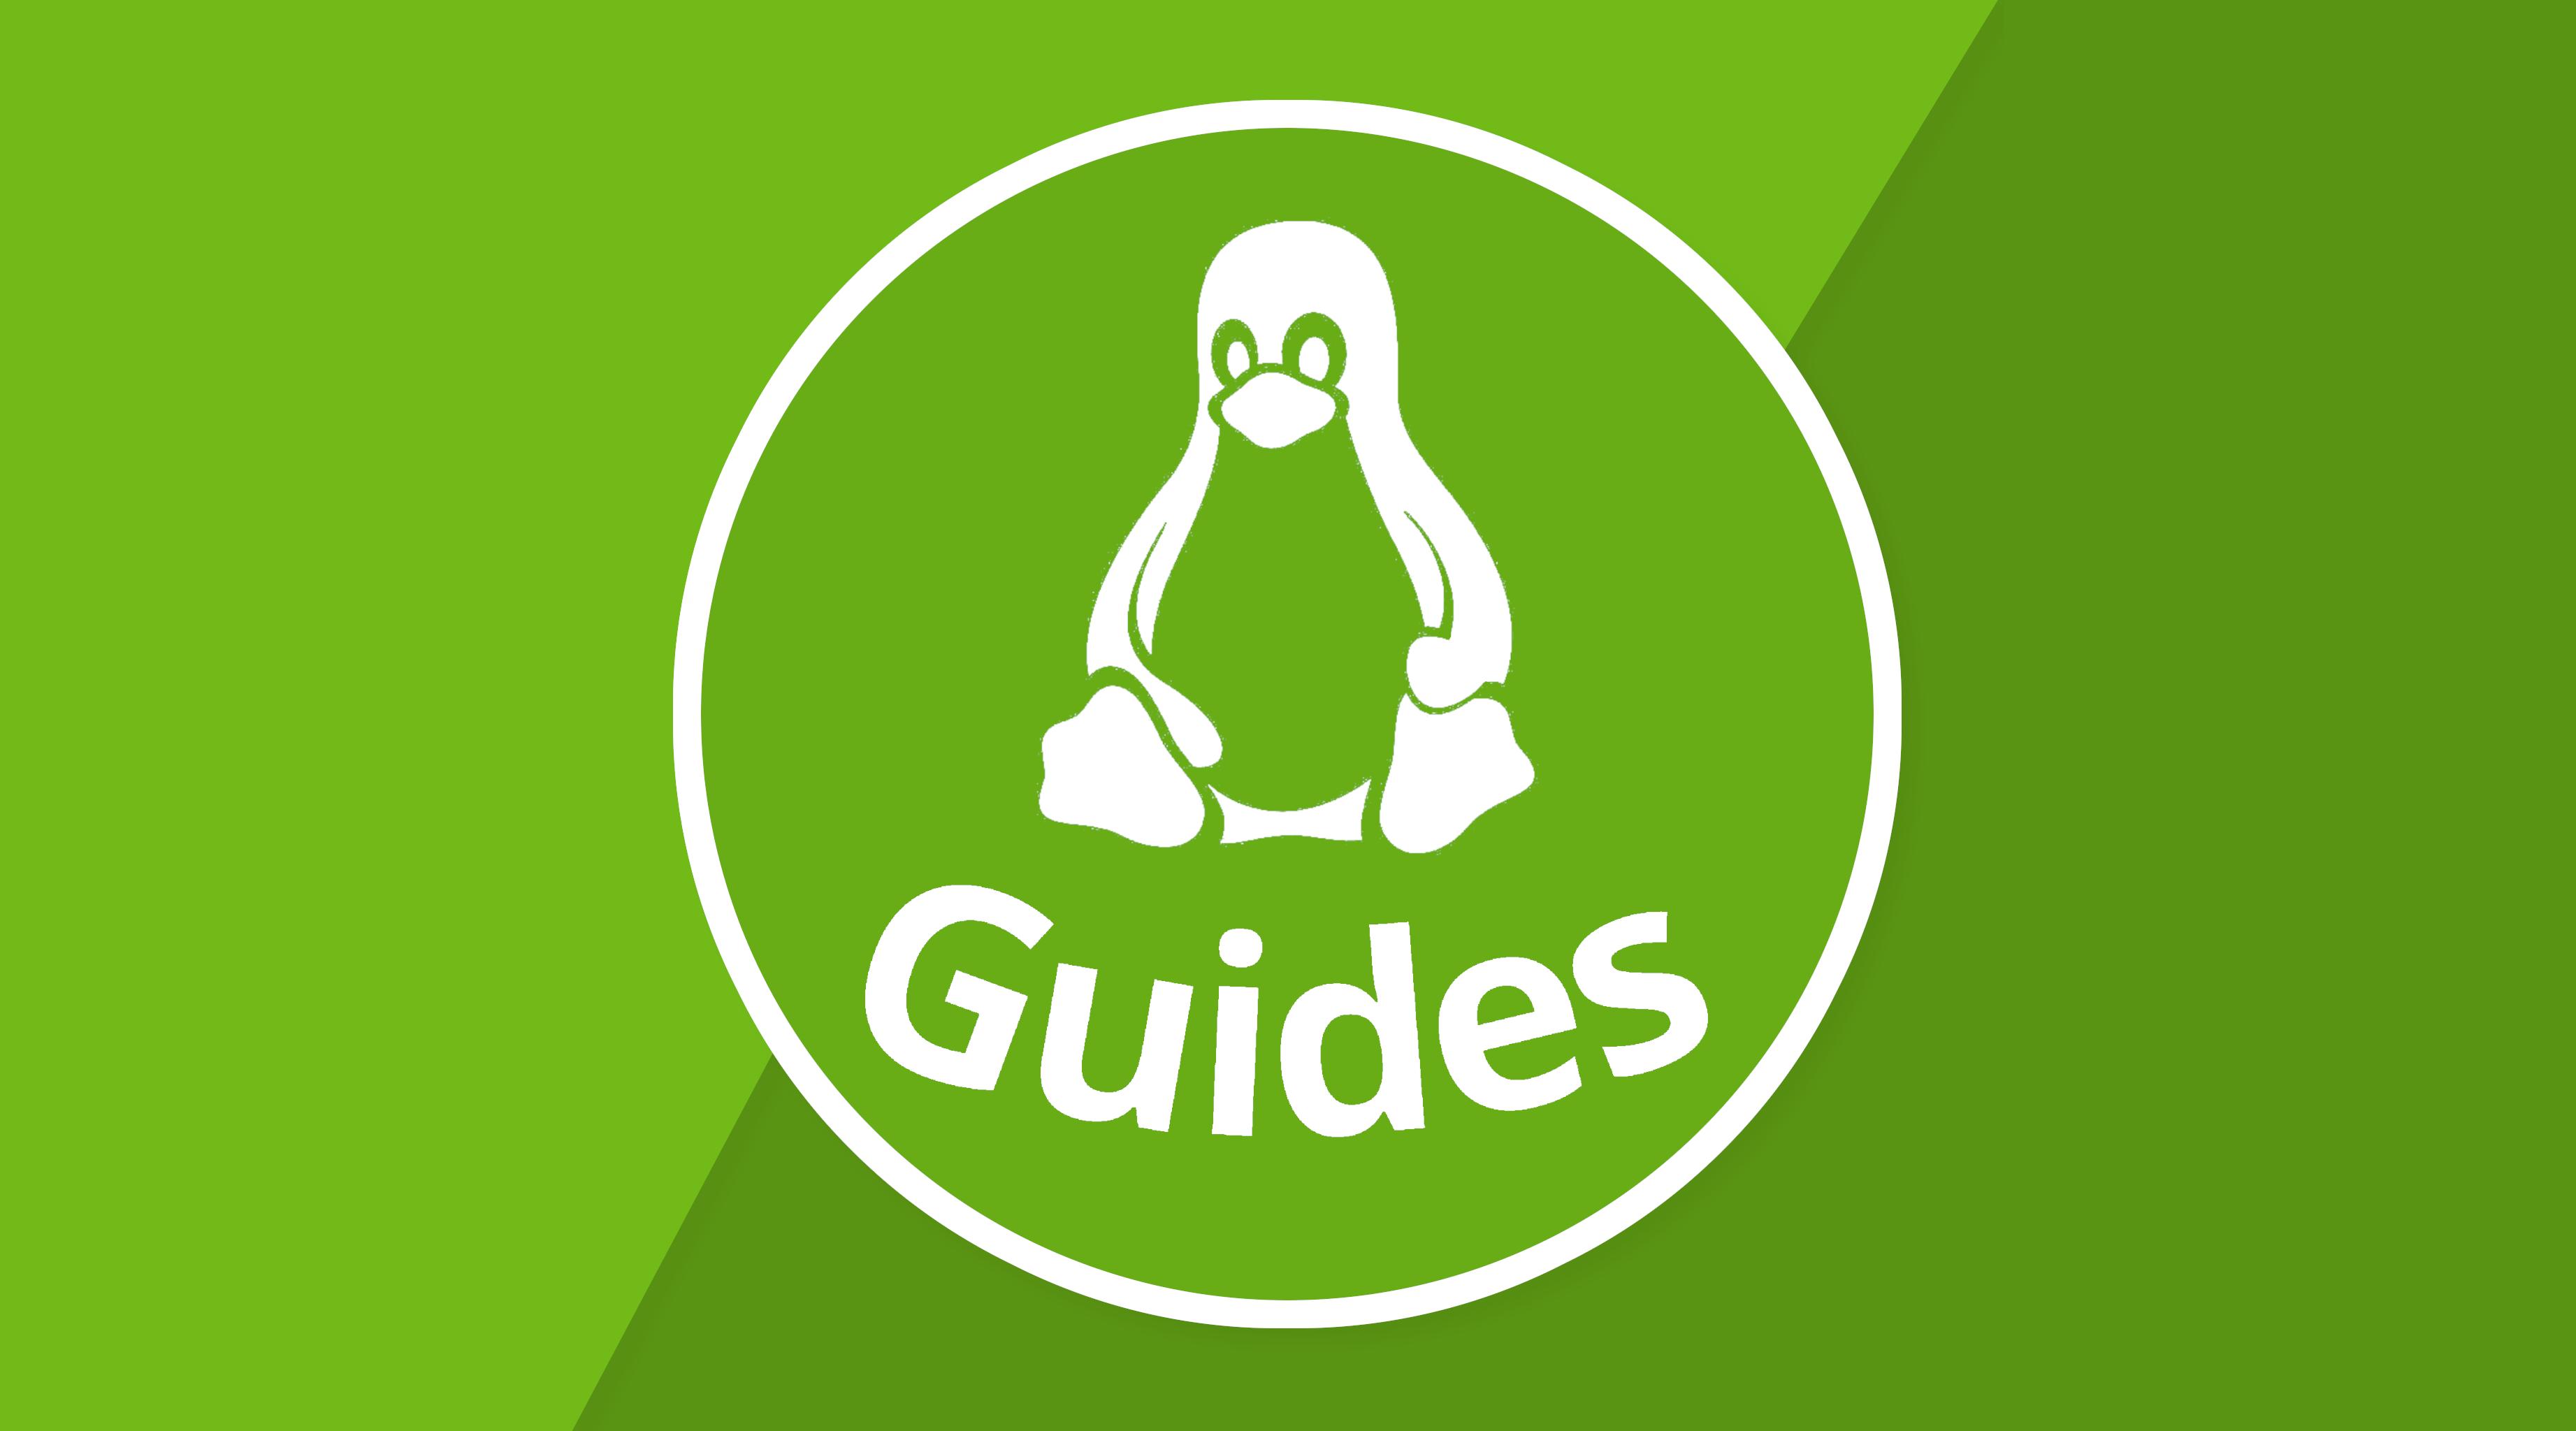 Logo von YouTube-Kanal Linux Guides